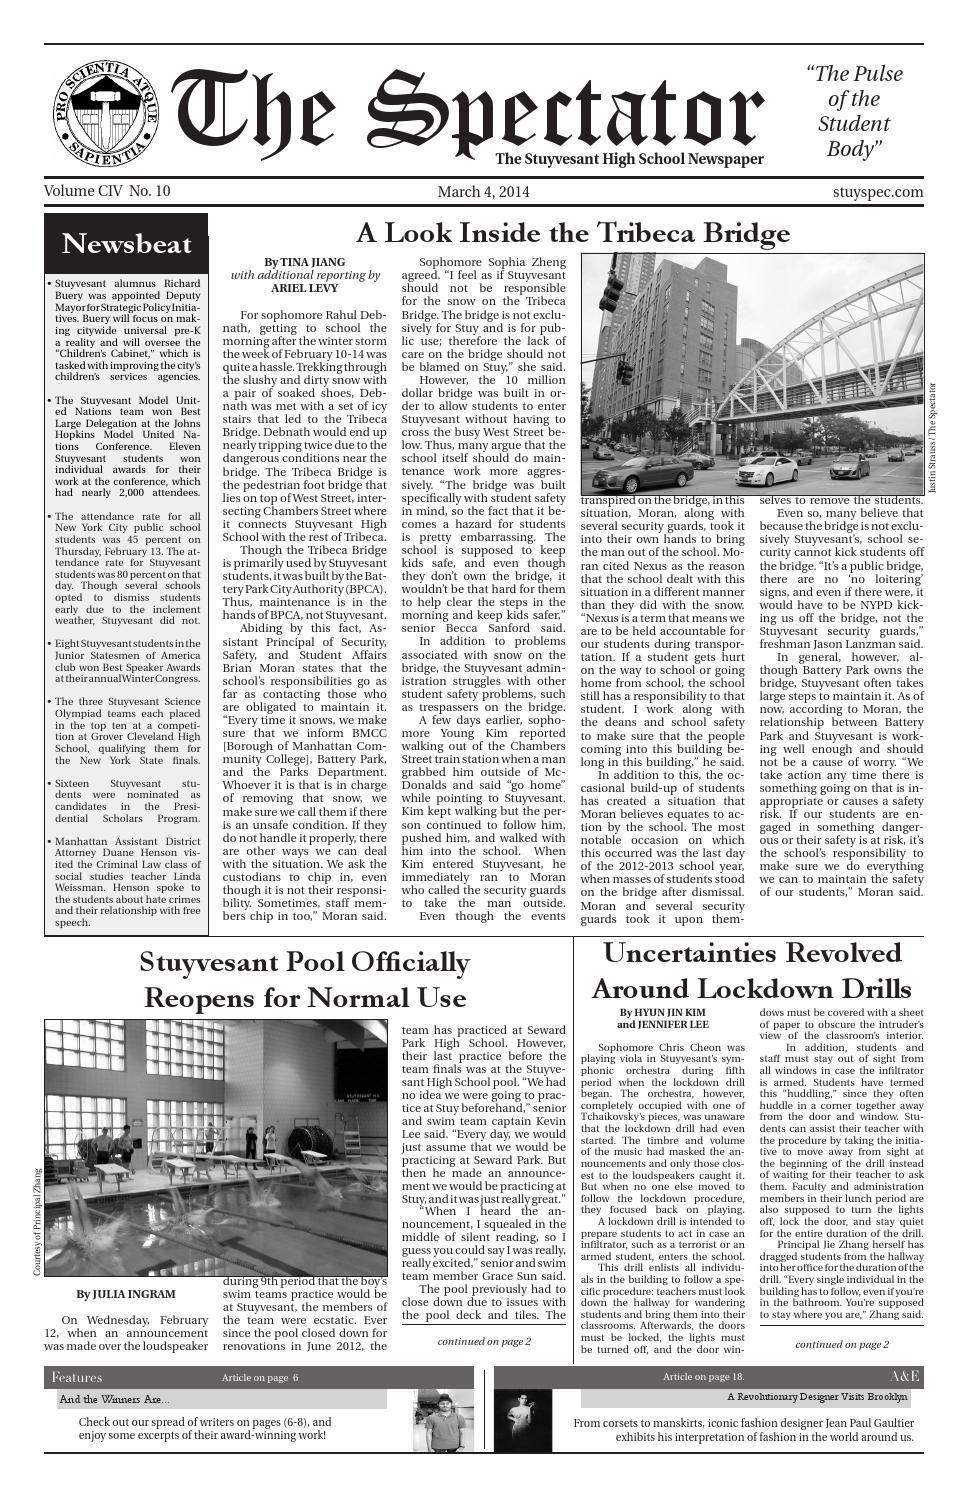 Volume 104, Issue 10 by The Stuyvesant Spectator issuu